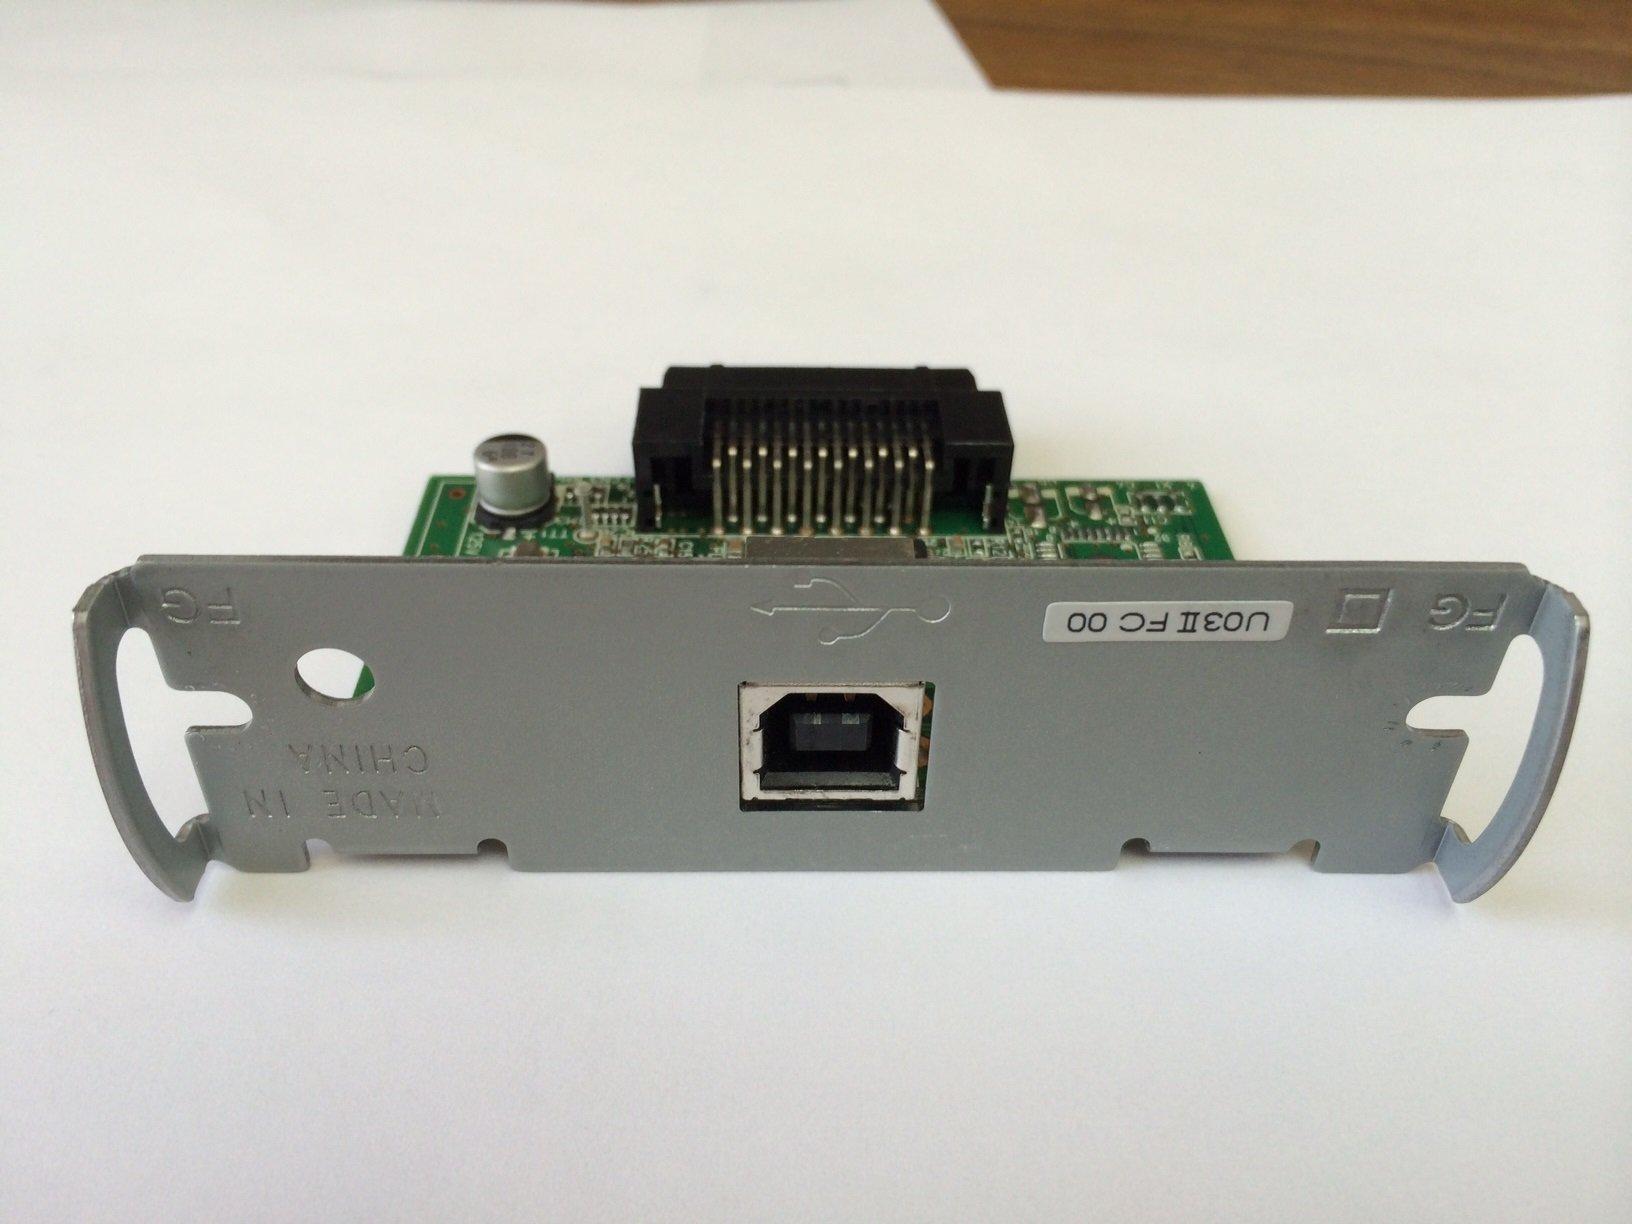 2E65066 - Epson U03II USB Interface Card by Epson